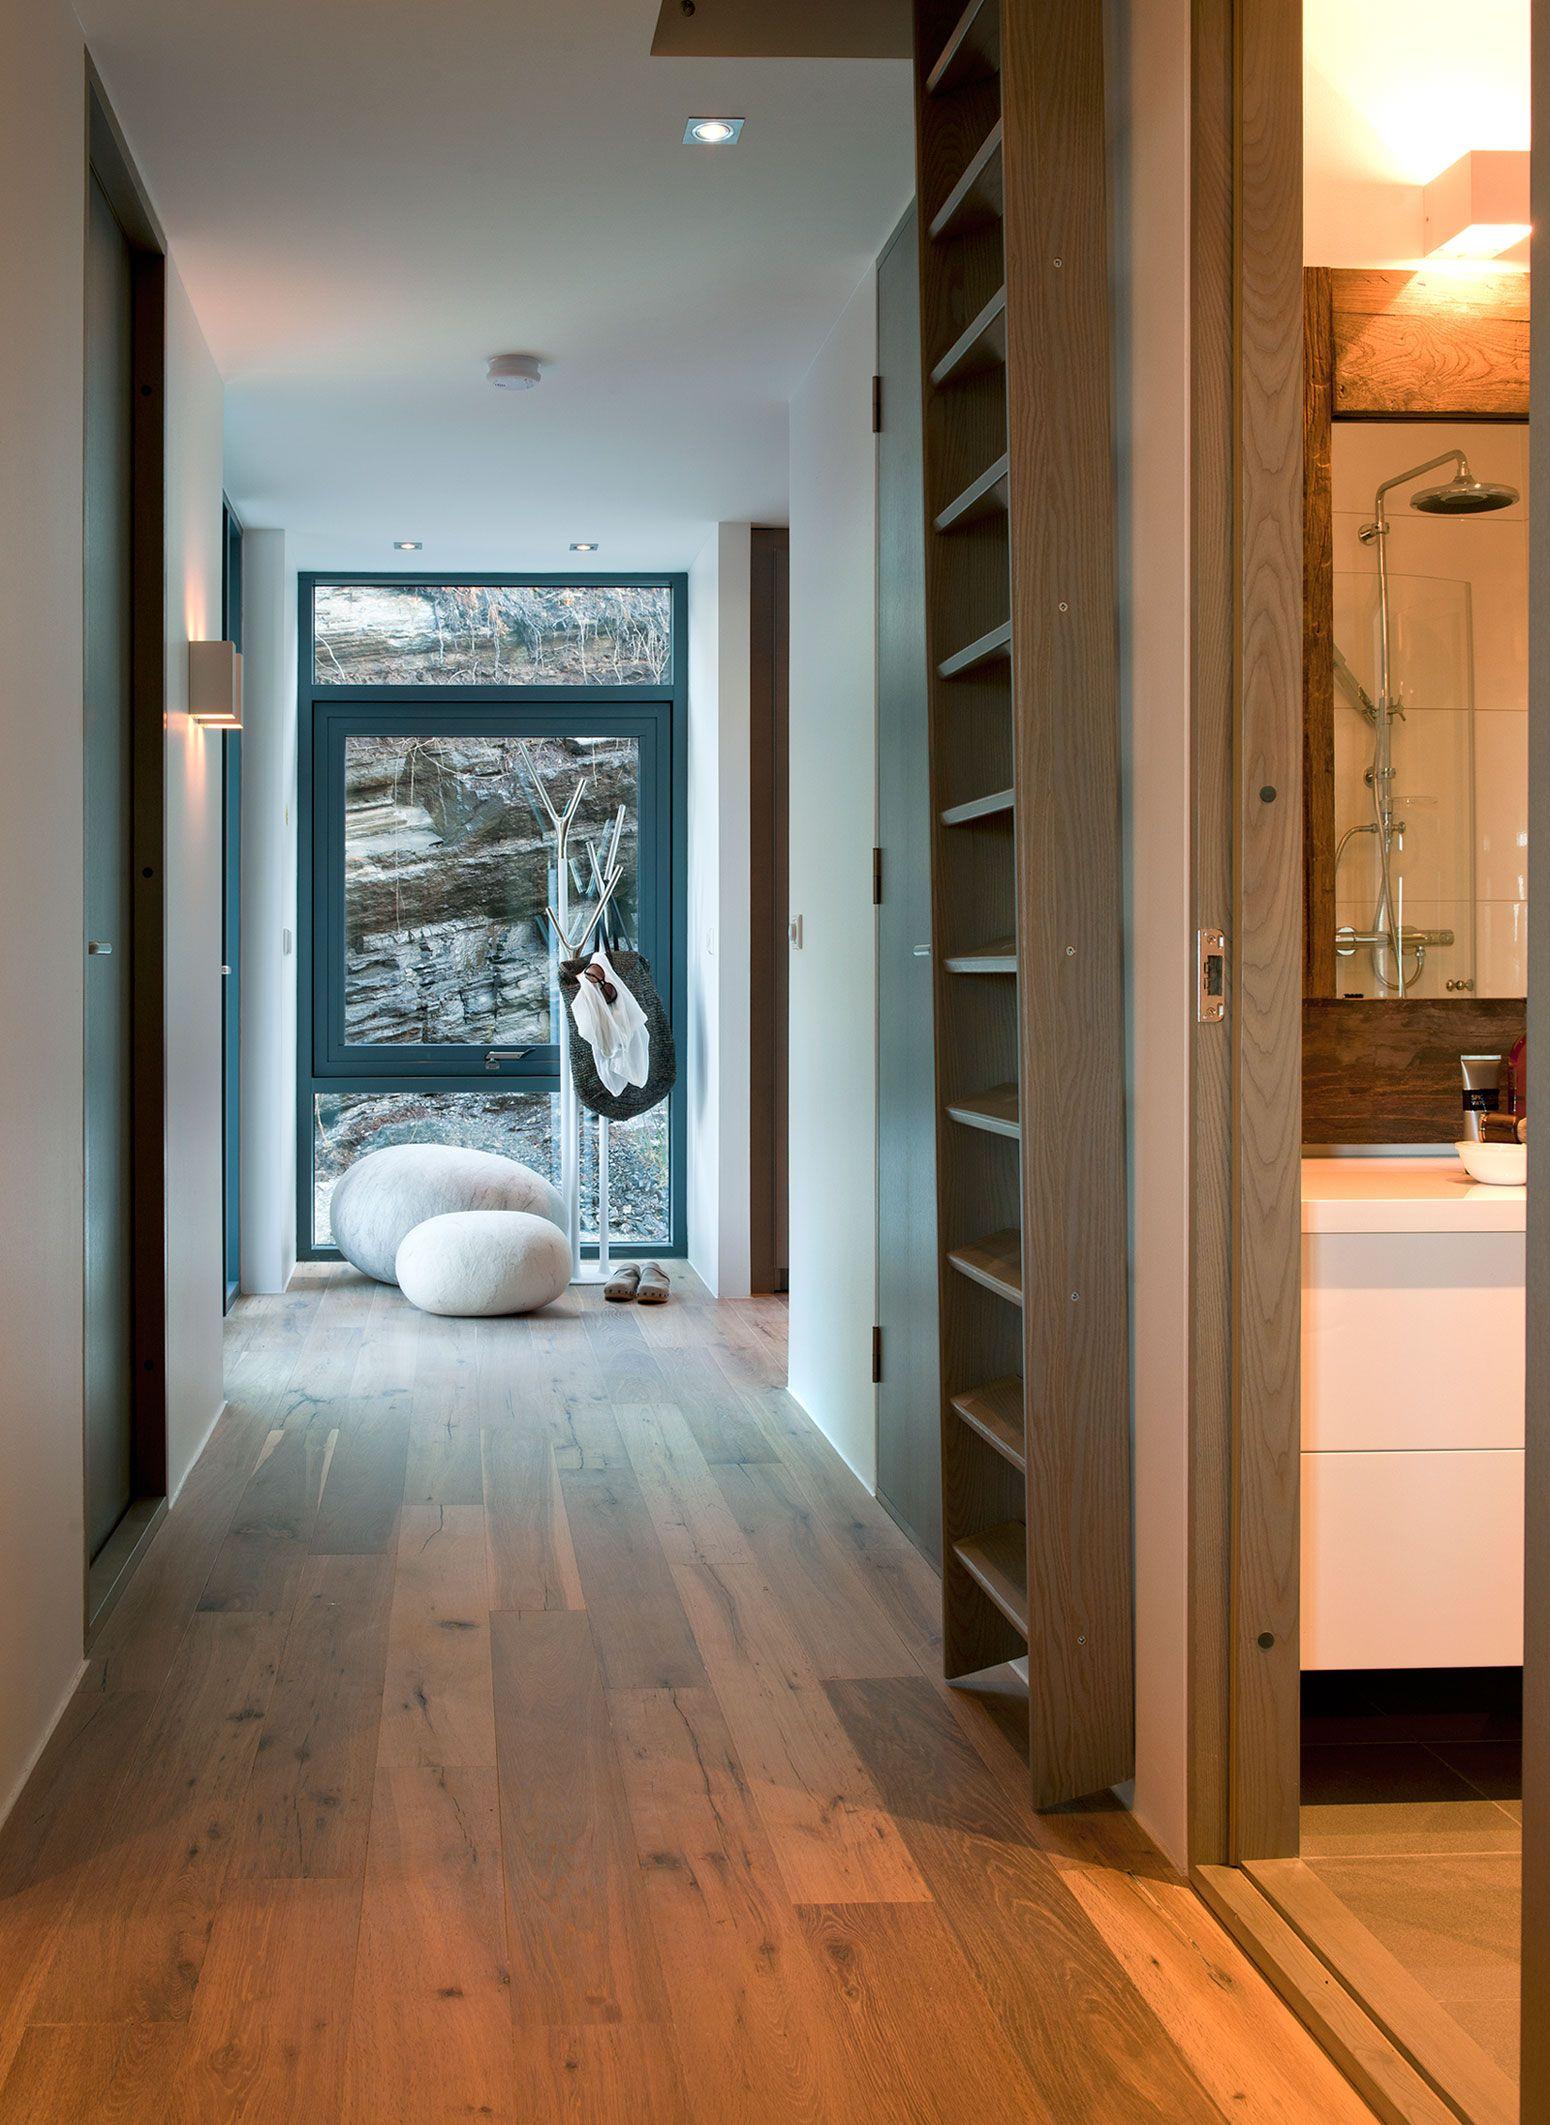 Modern cabin gj 9 by gudmundur jonsson architect 3